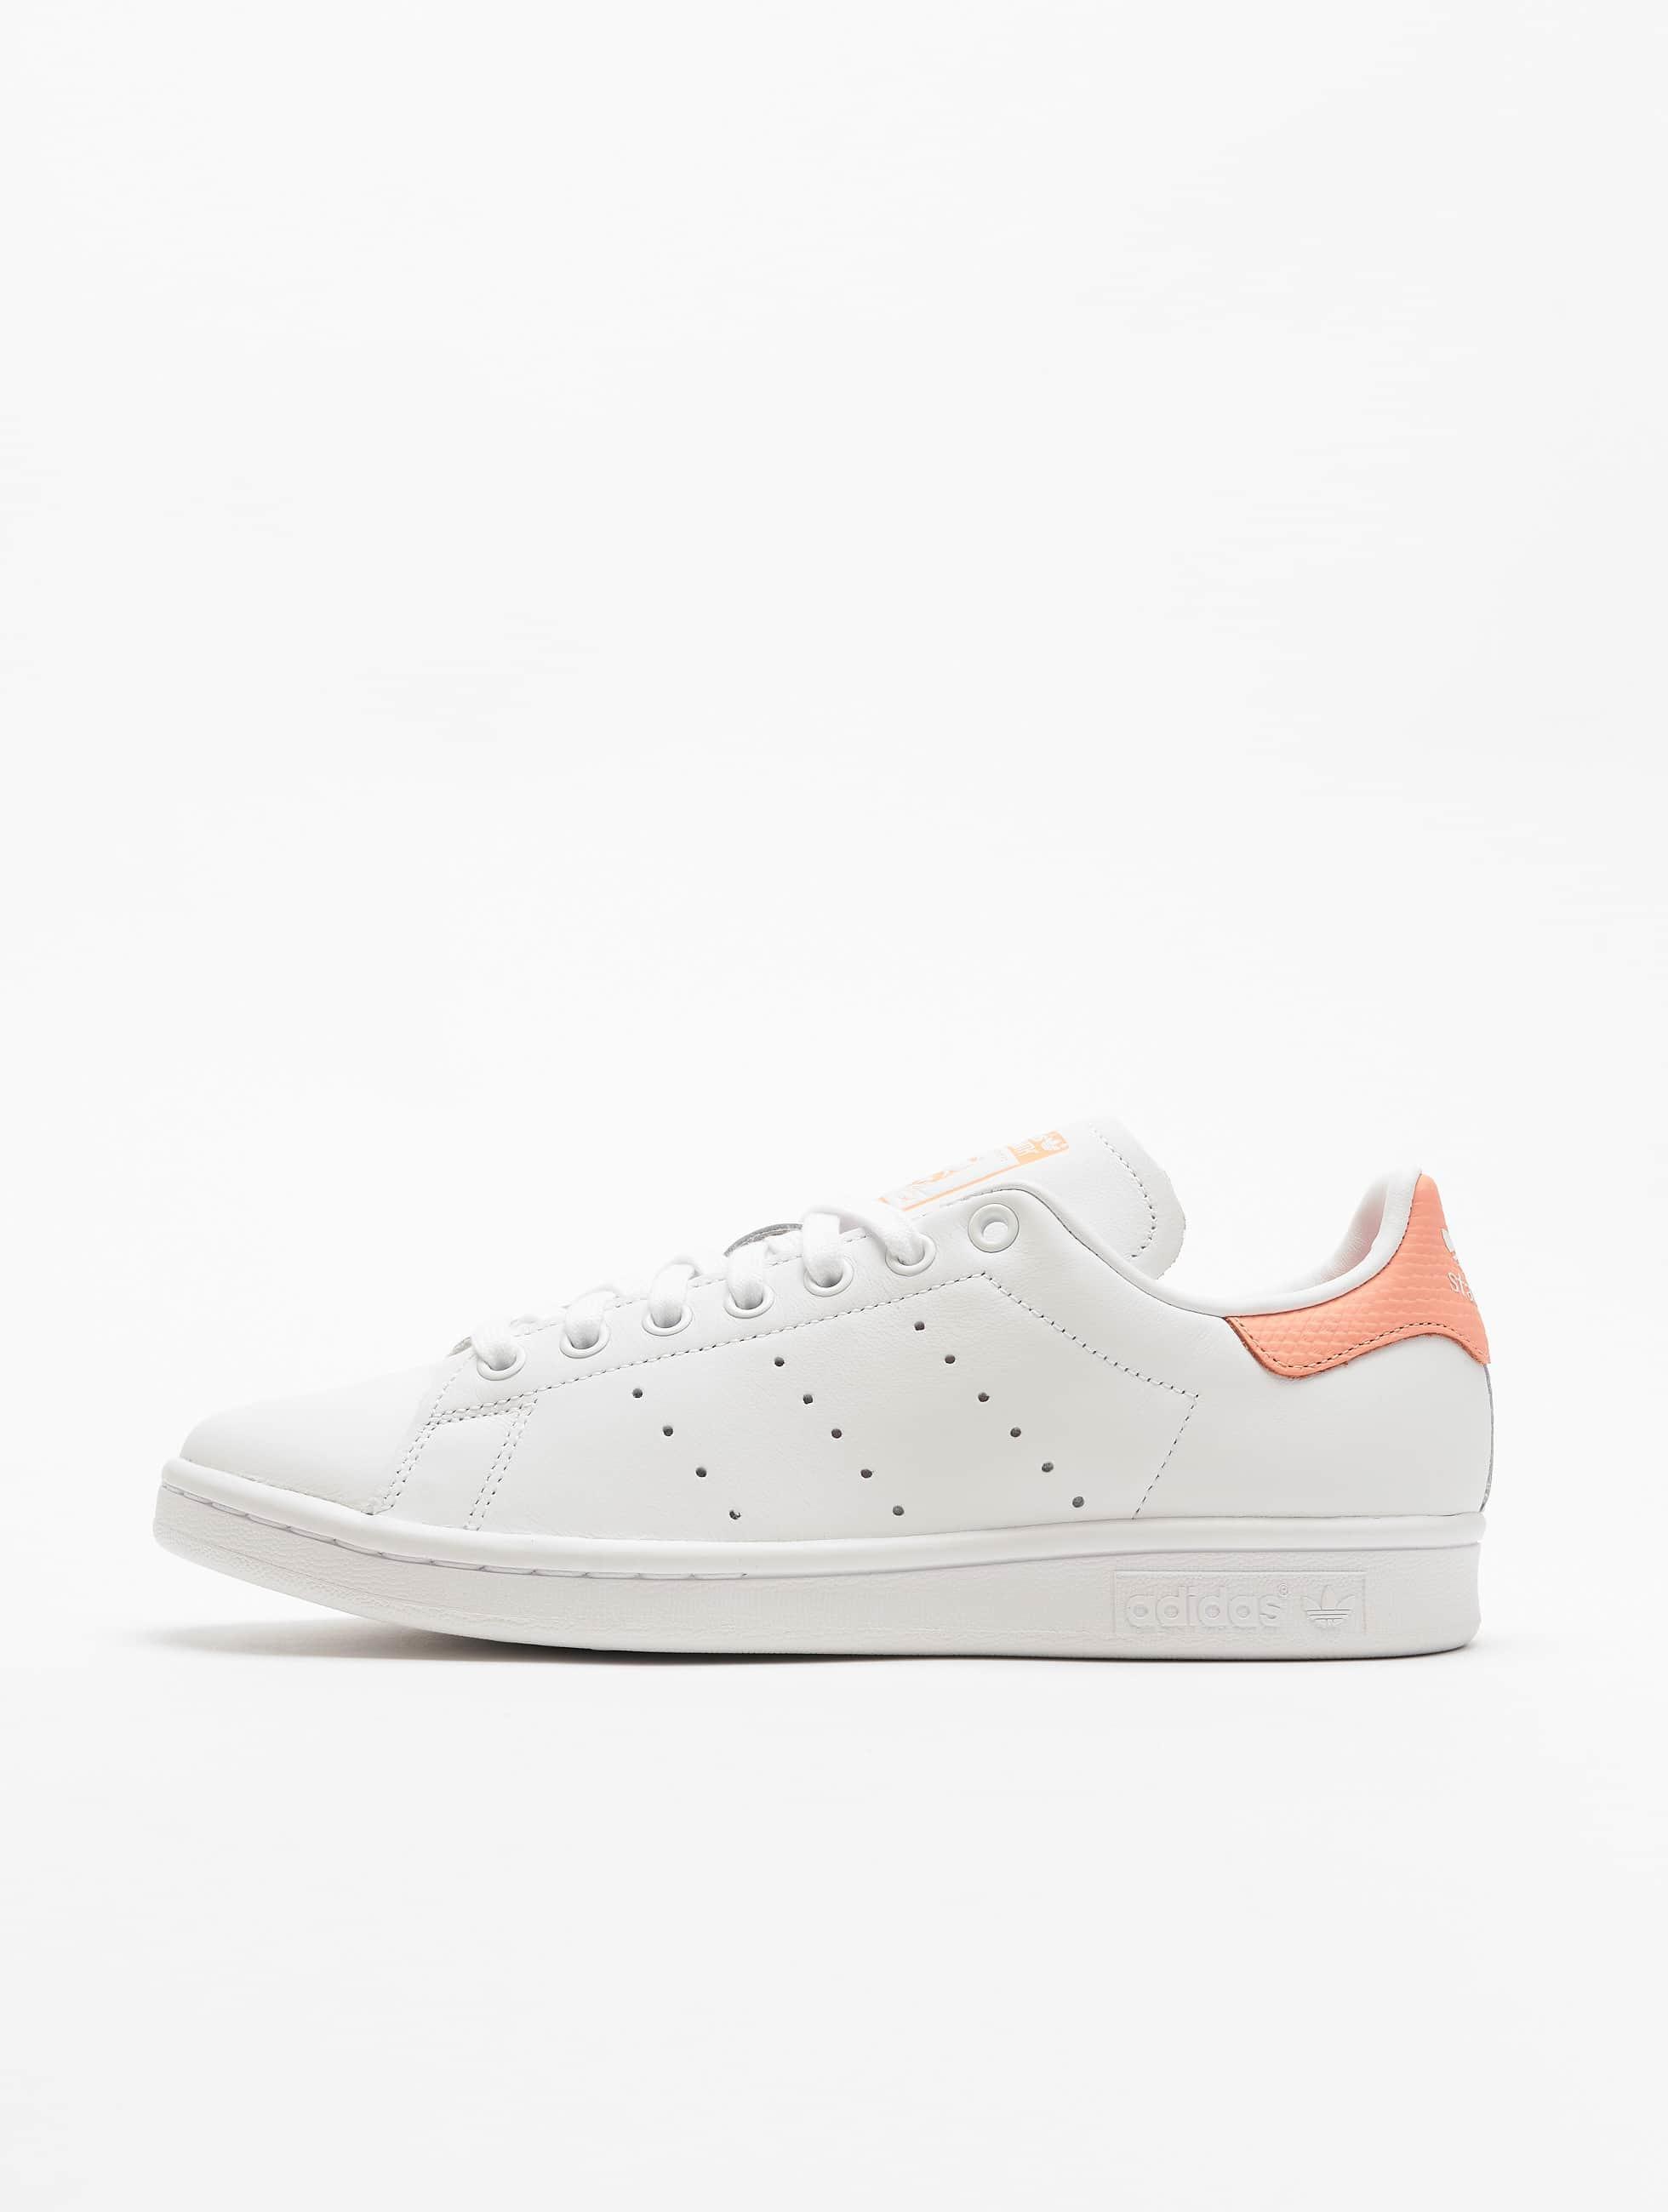 adidas Originals Stan Smith Sneakers Ftwr WhiteFtwr WhiteChalk Coral